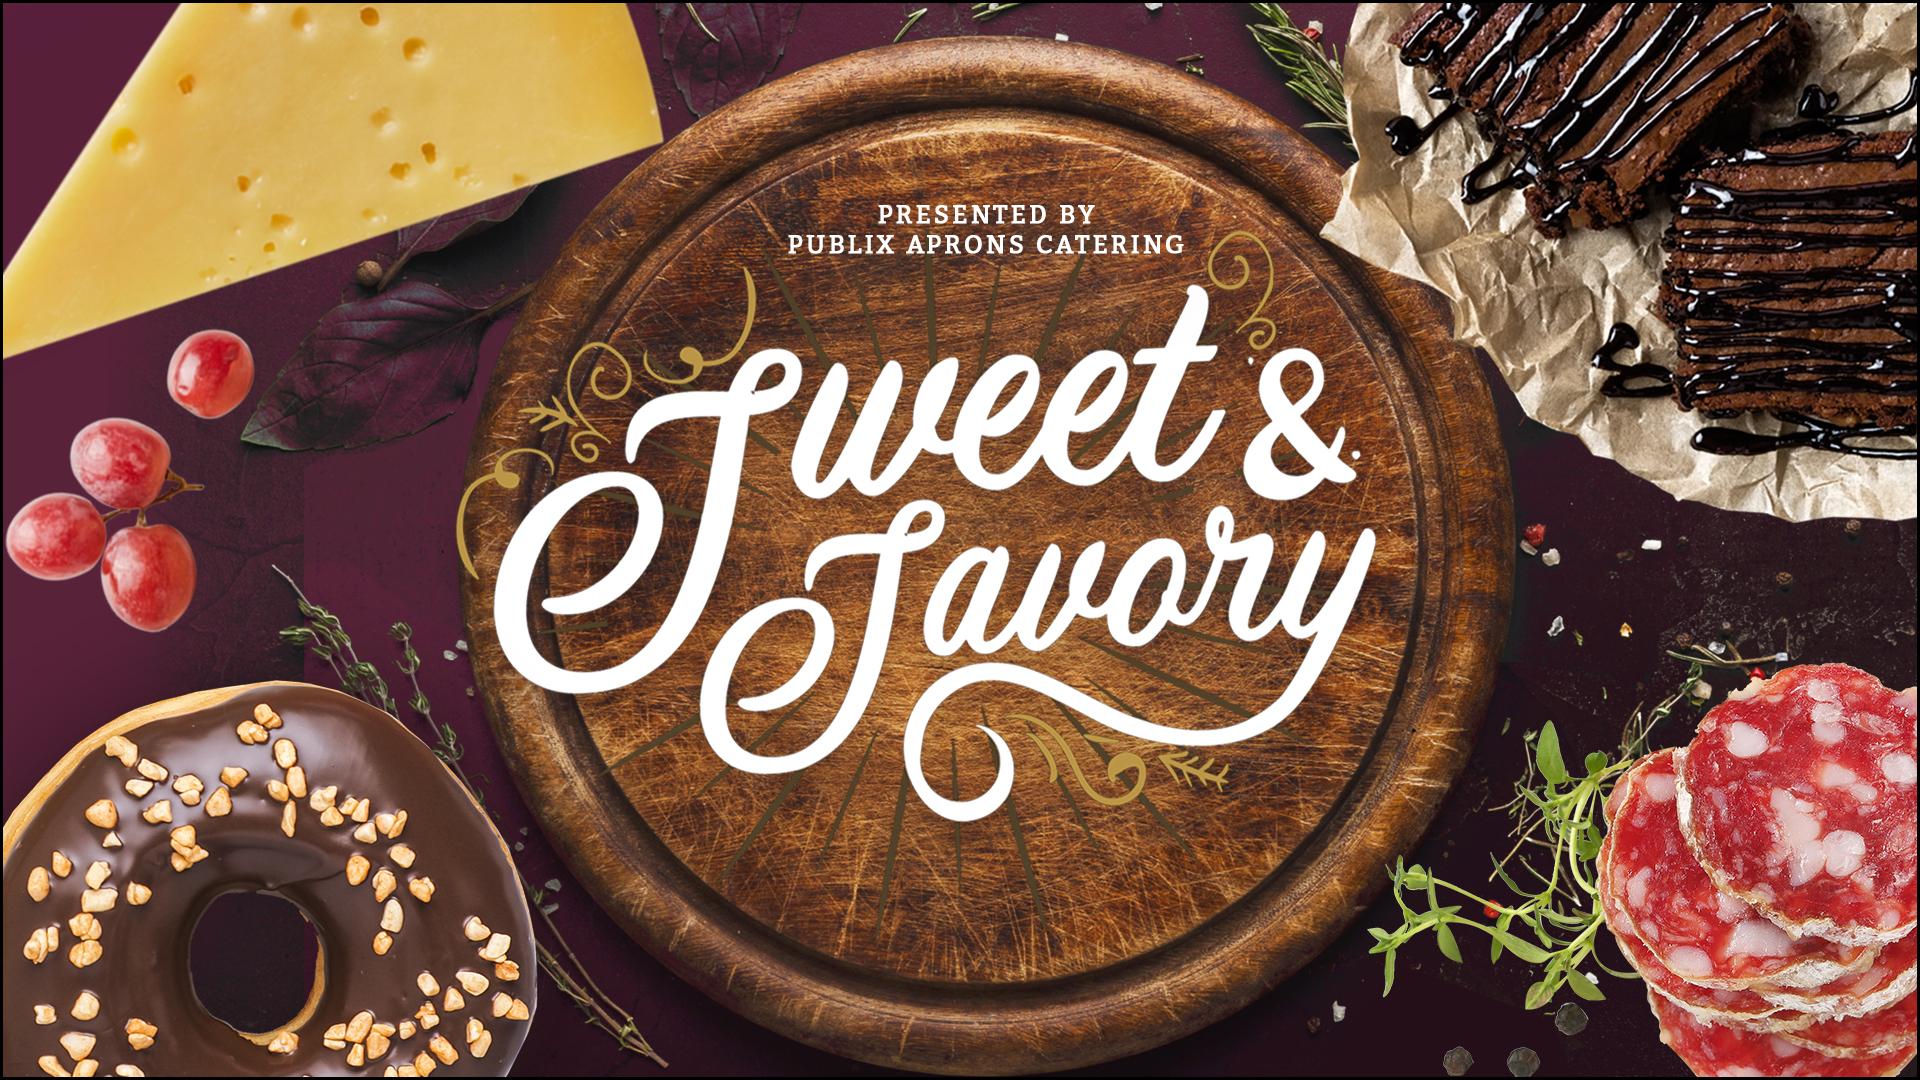 Sweet Savory Tickets The Veranda Thornton Park Orlando Fl Vip Early Entry Begins At 6pm Weekly